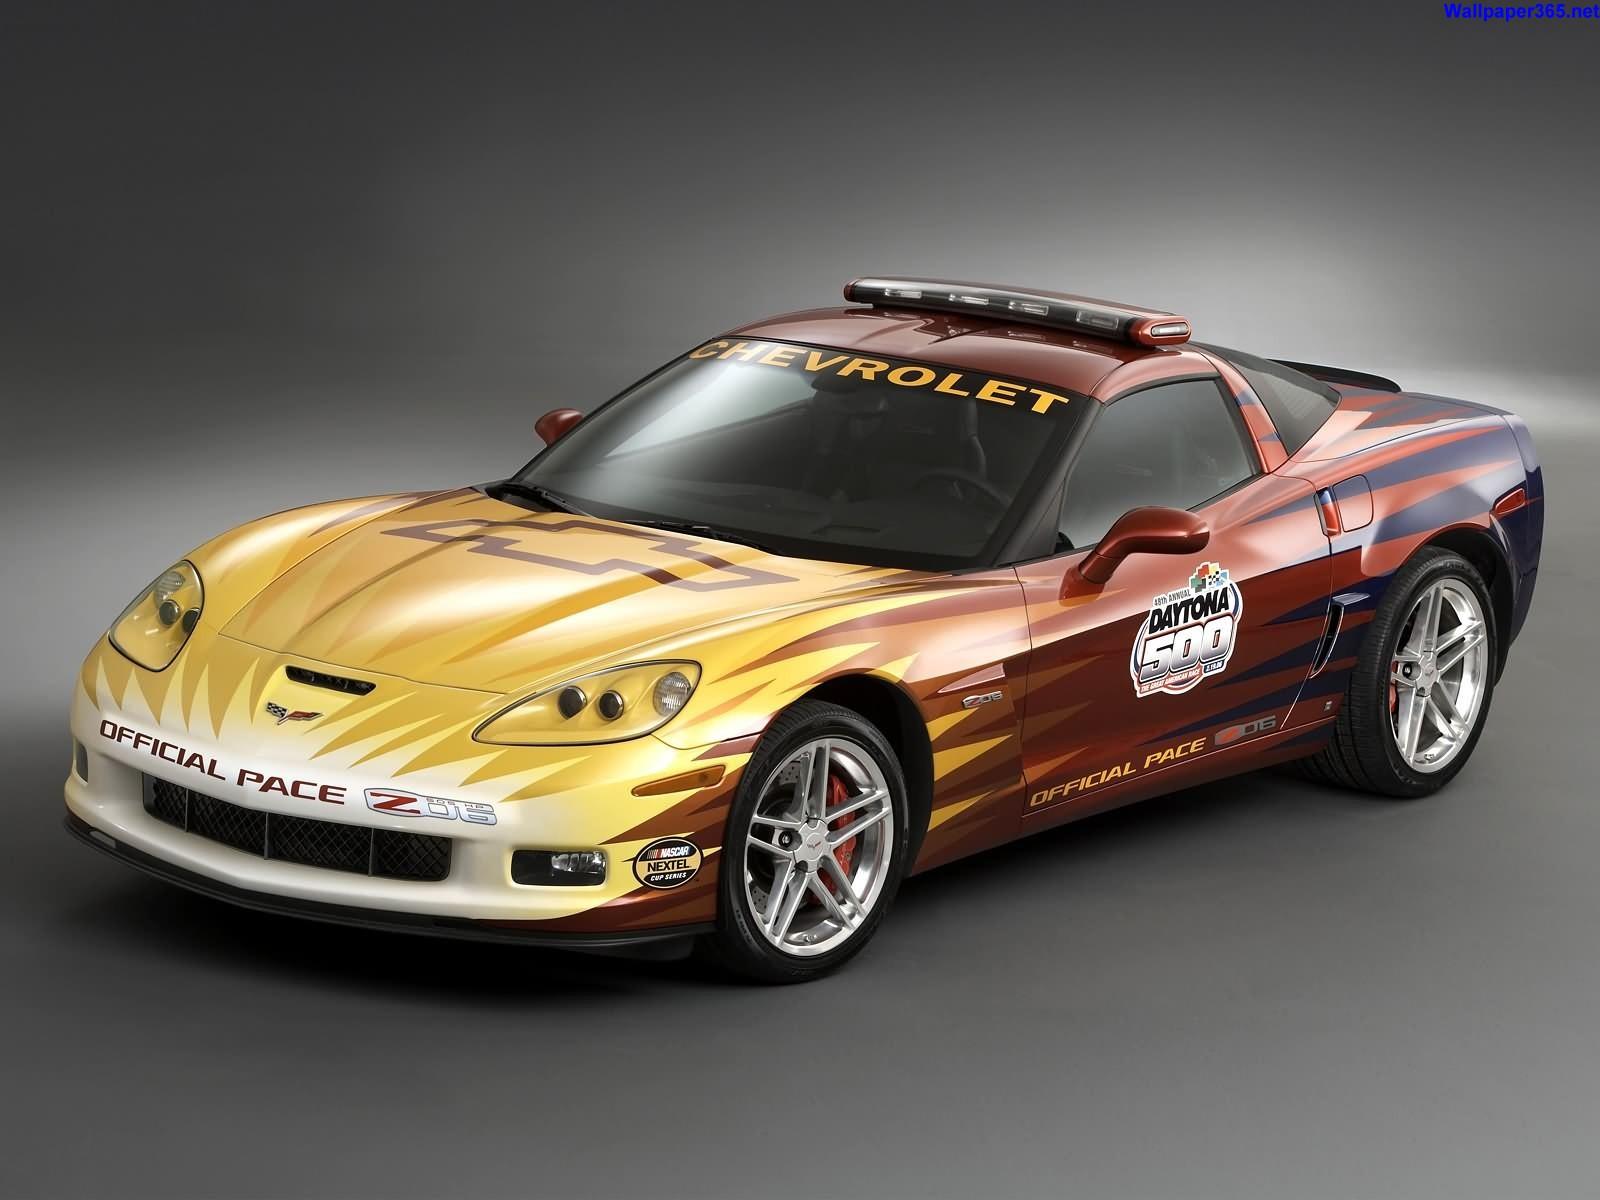 http://3.bp.blogspot.com/-35R9I-DVDDI/TpzaJumIxLI/AAAAAAAAAfE/OpZF886pF9o/s1600/Chevrolet+Corvette+%252812%2529.jpg